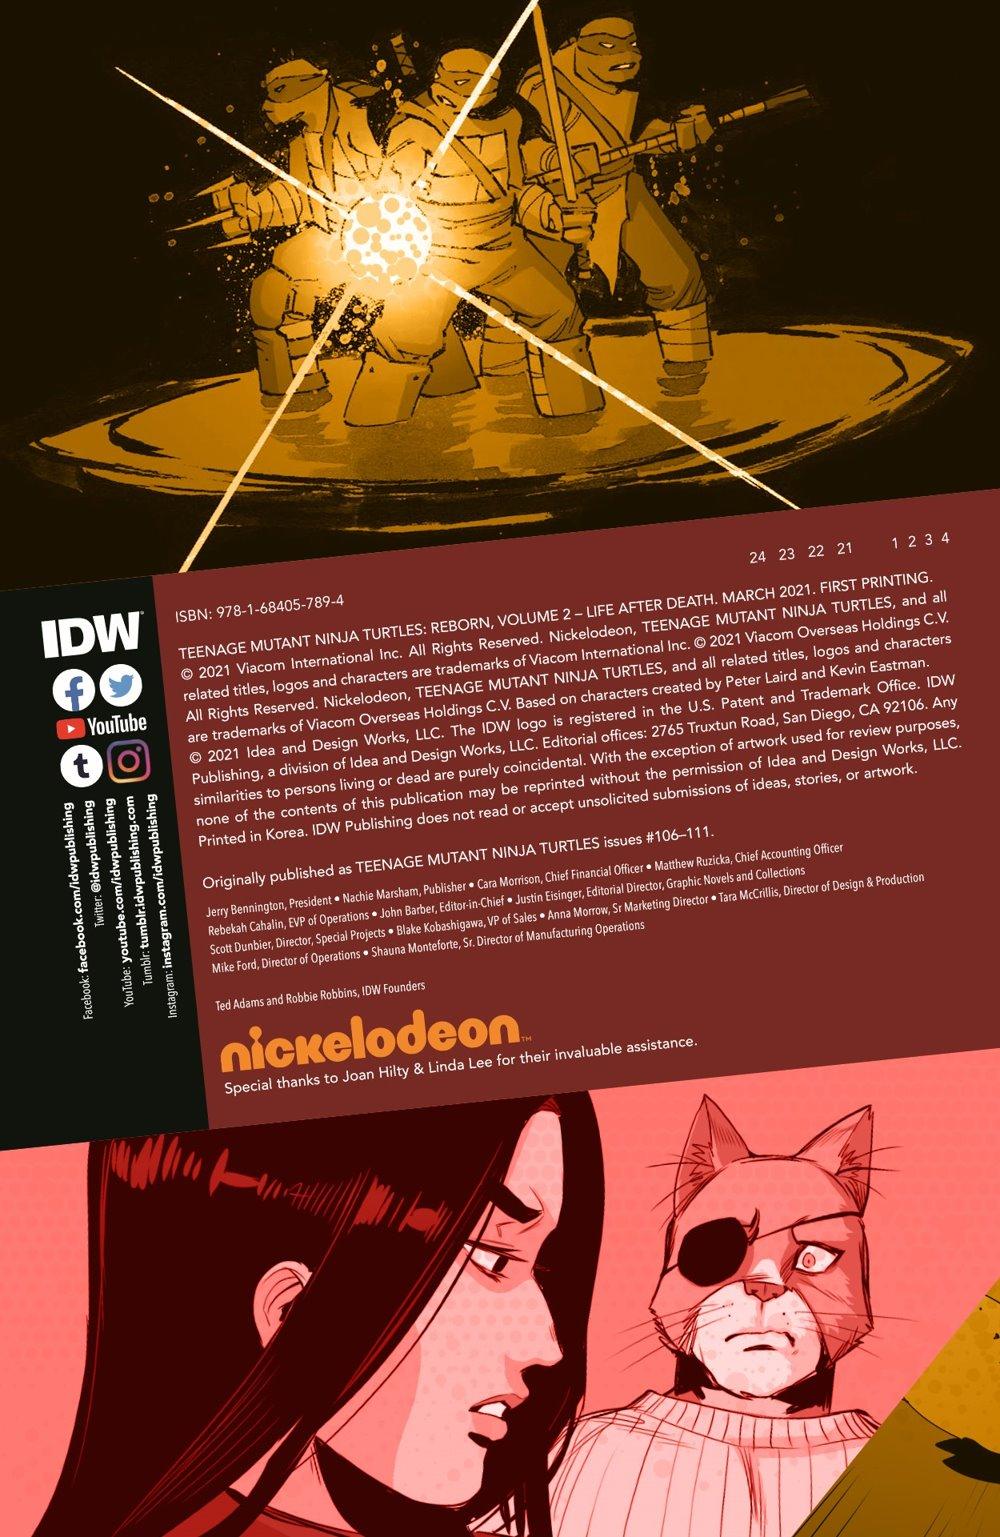 TMNT-Reborn02_pr-2 ComicList Previews: TEENAGE MUTANT NINJA TURTLES REBORN VOLUME 2 LIFE AFTER DEATH TP